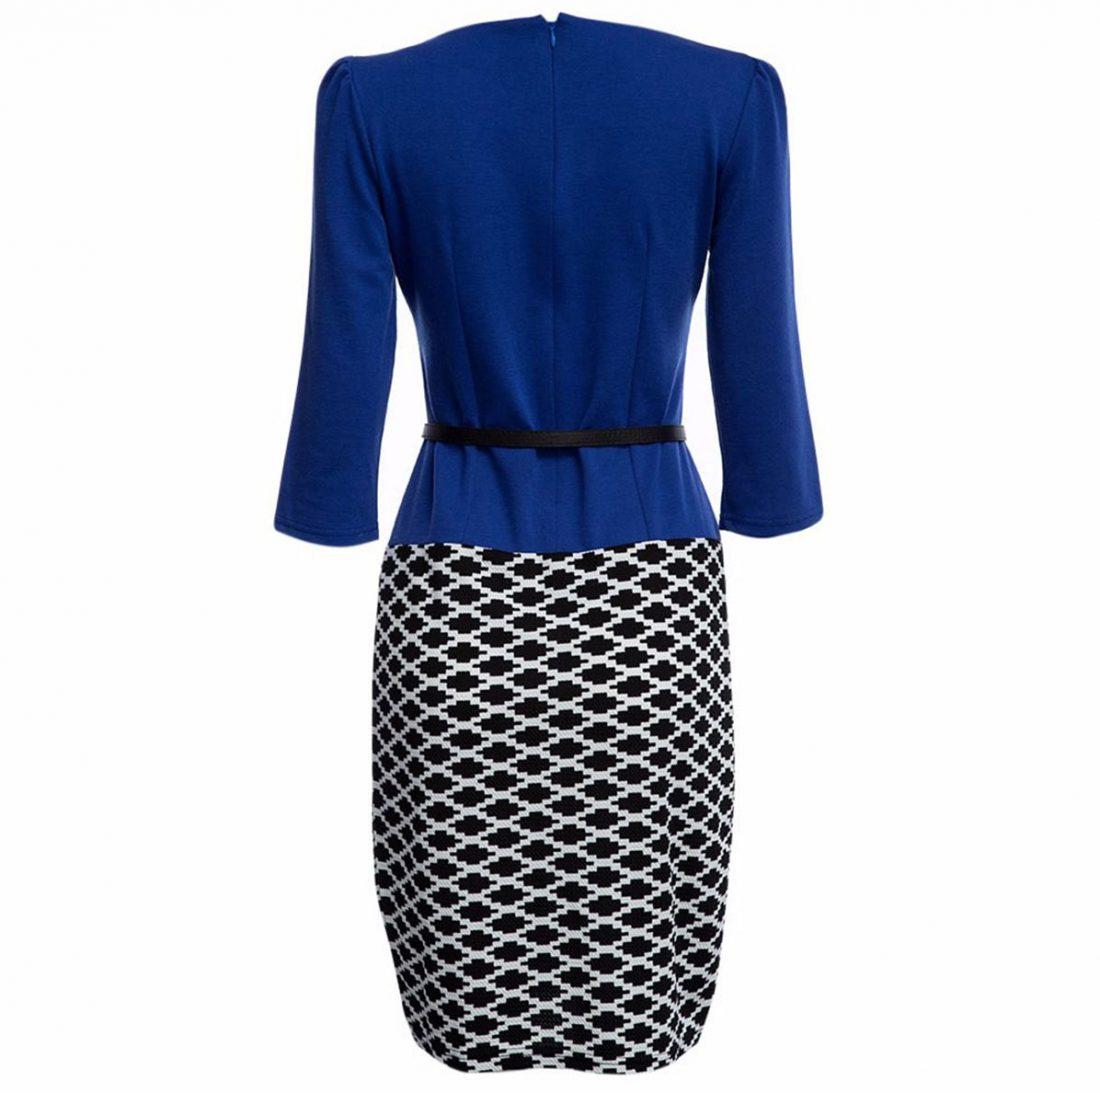 M0187 blueblack2 Office Evening Dresses maureens.com boutique